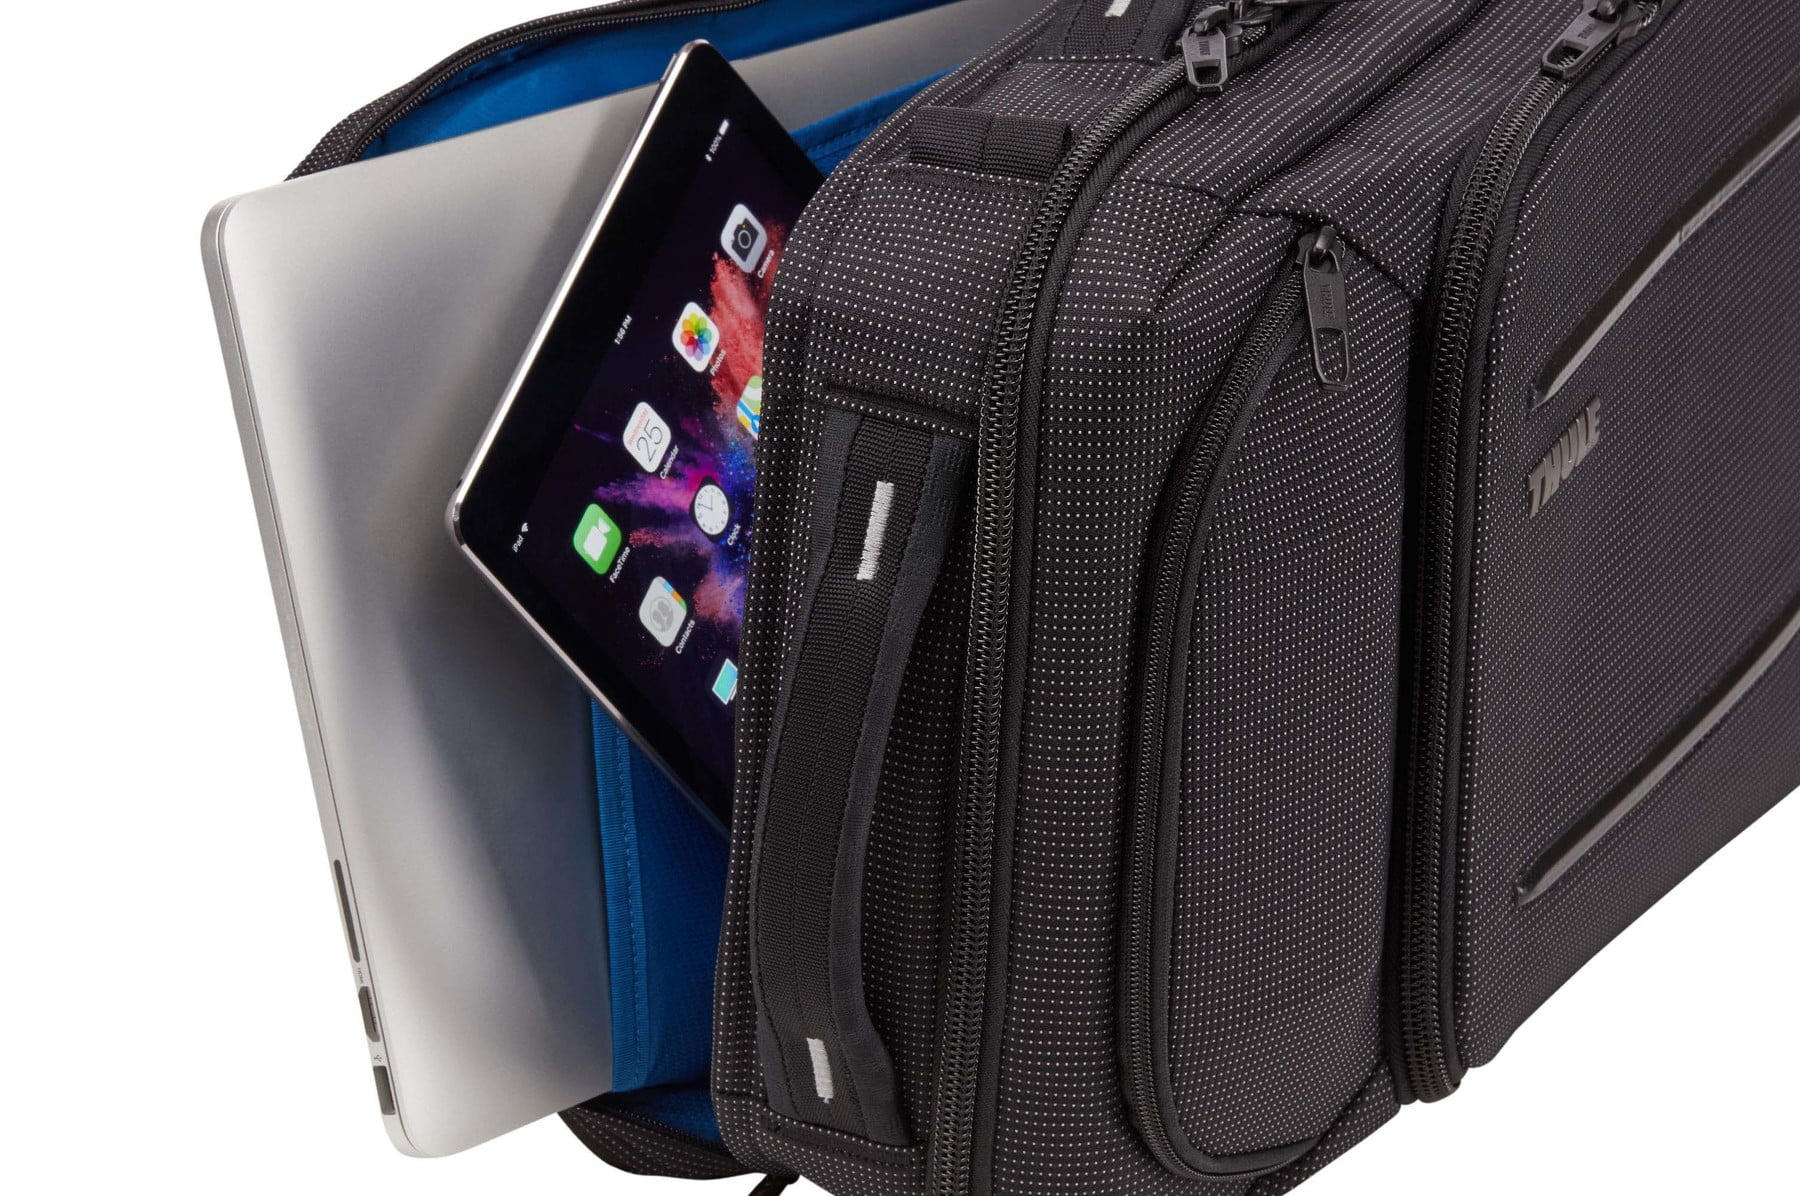 Geanta laptop Thule Crossover 2 Convertible Laptop Bag 15.6 inchi Black 8